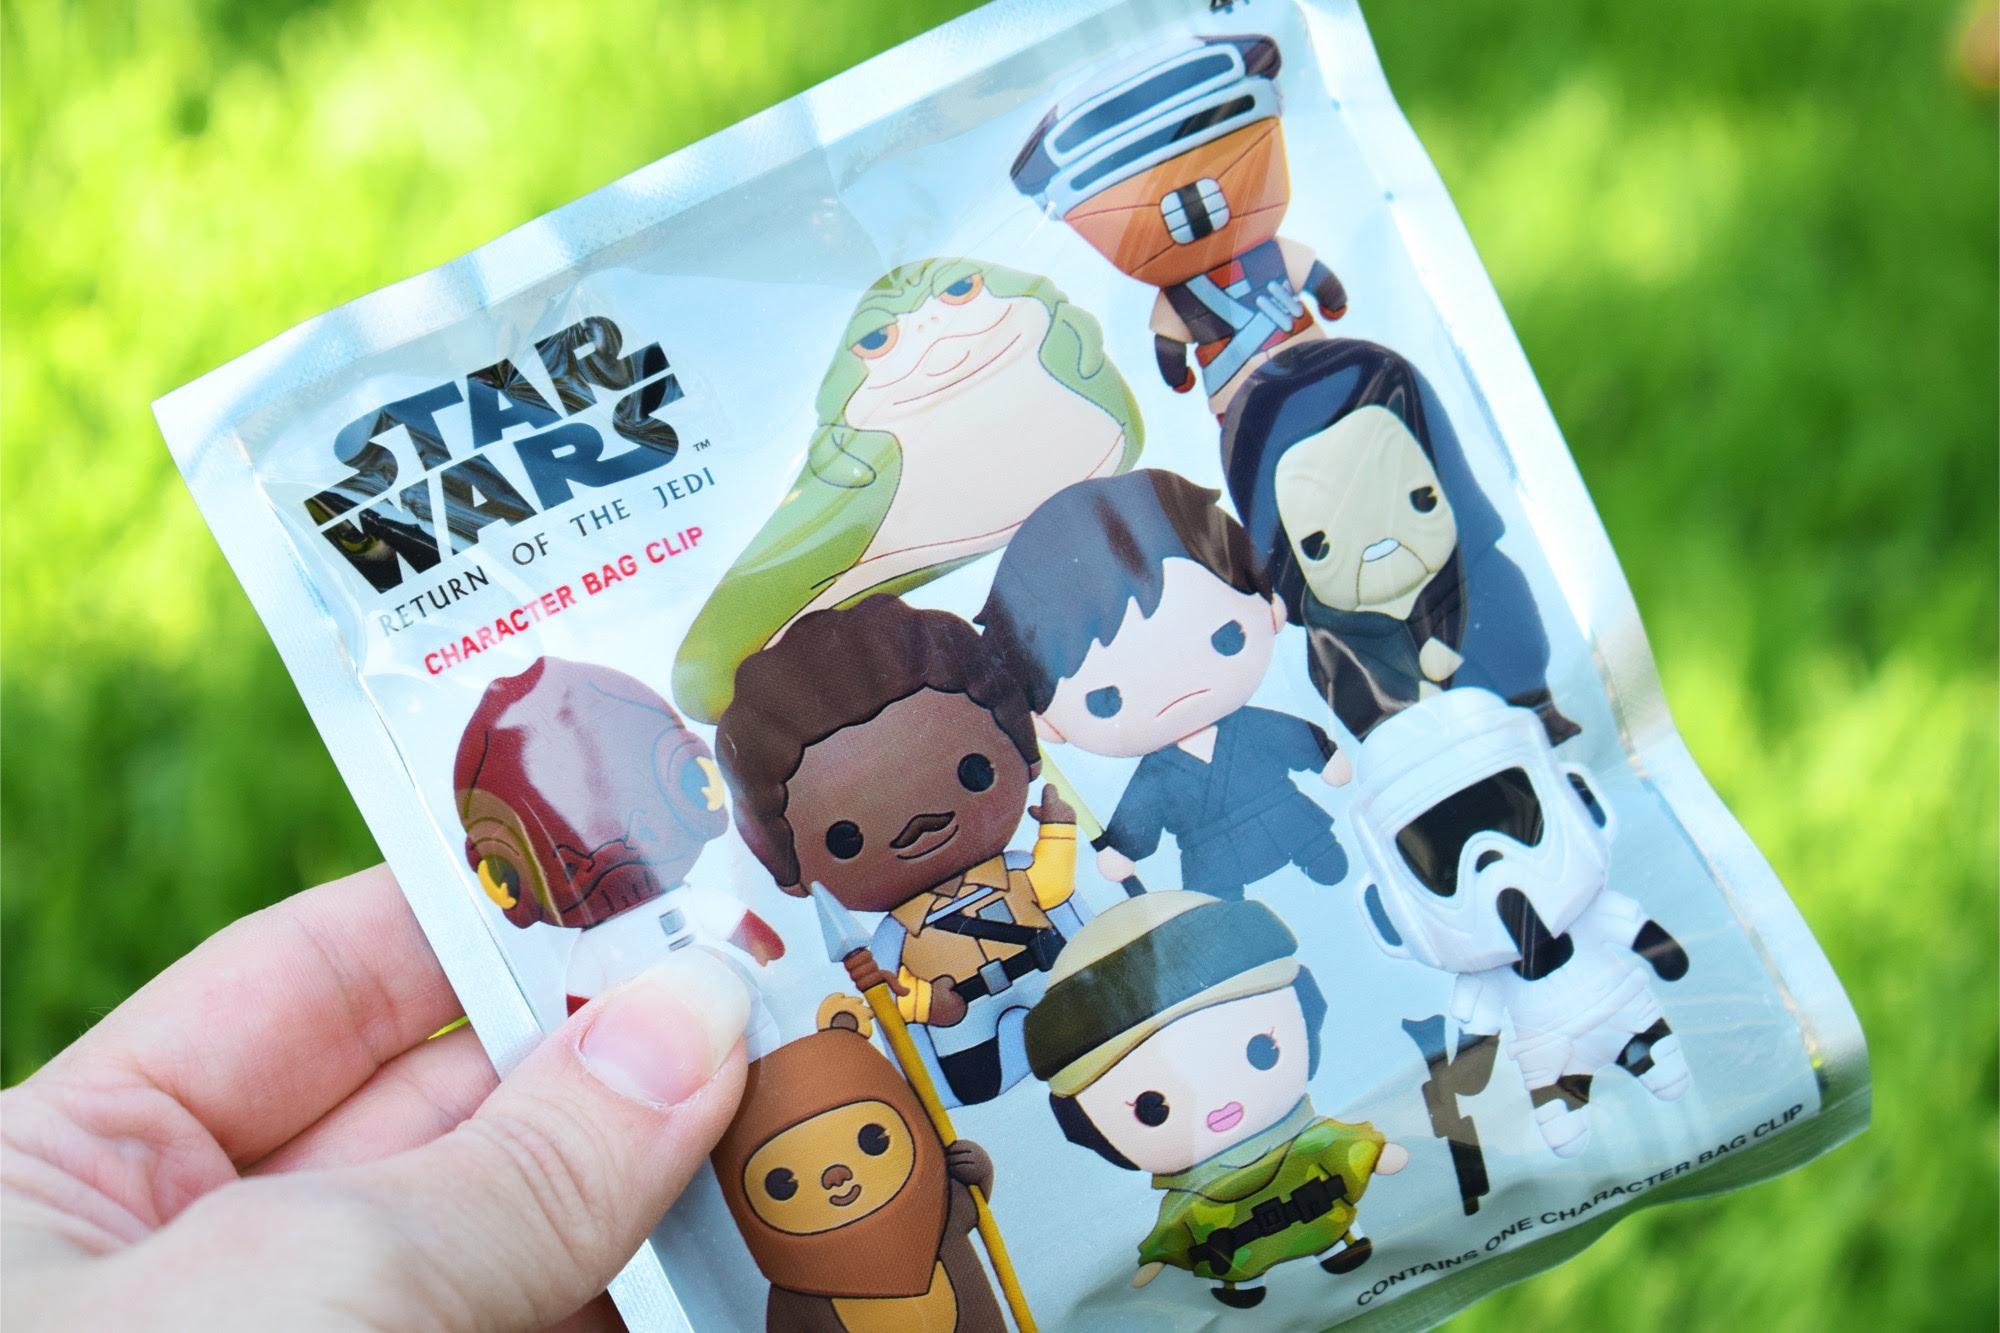 Star Wars 332nd Clone Trooper Helmet Review - SamoilovART | Anakin and His Angel